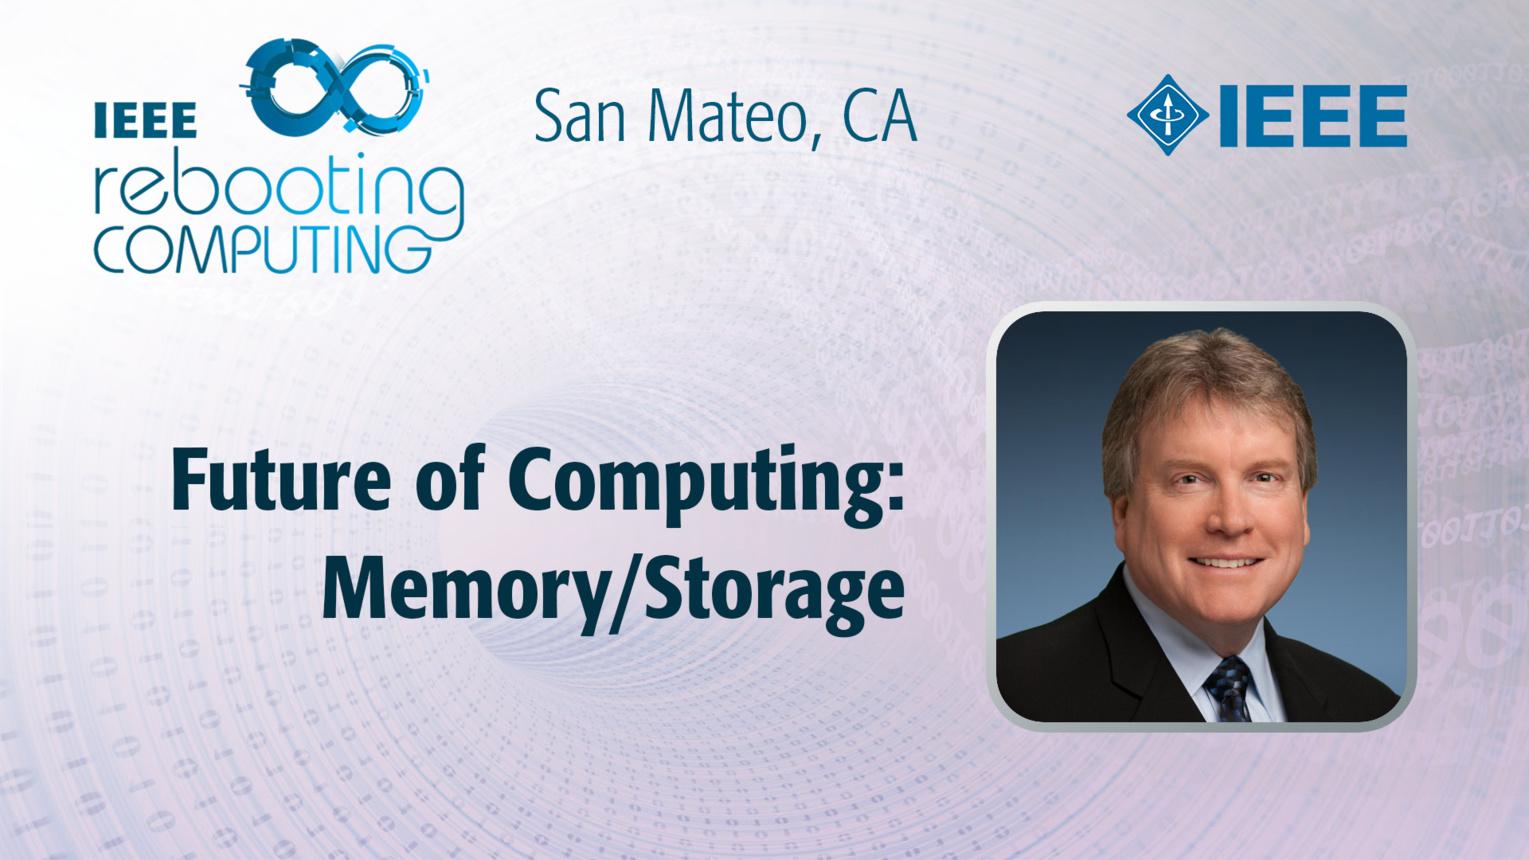 Future of Computing: Memory/Storage - Steve Pawlowski - ICRC San Mateo, 2019